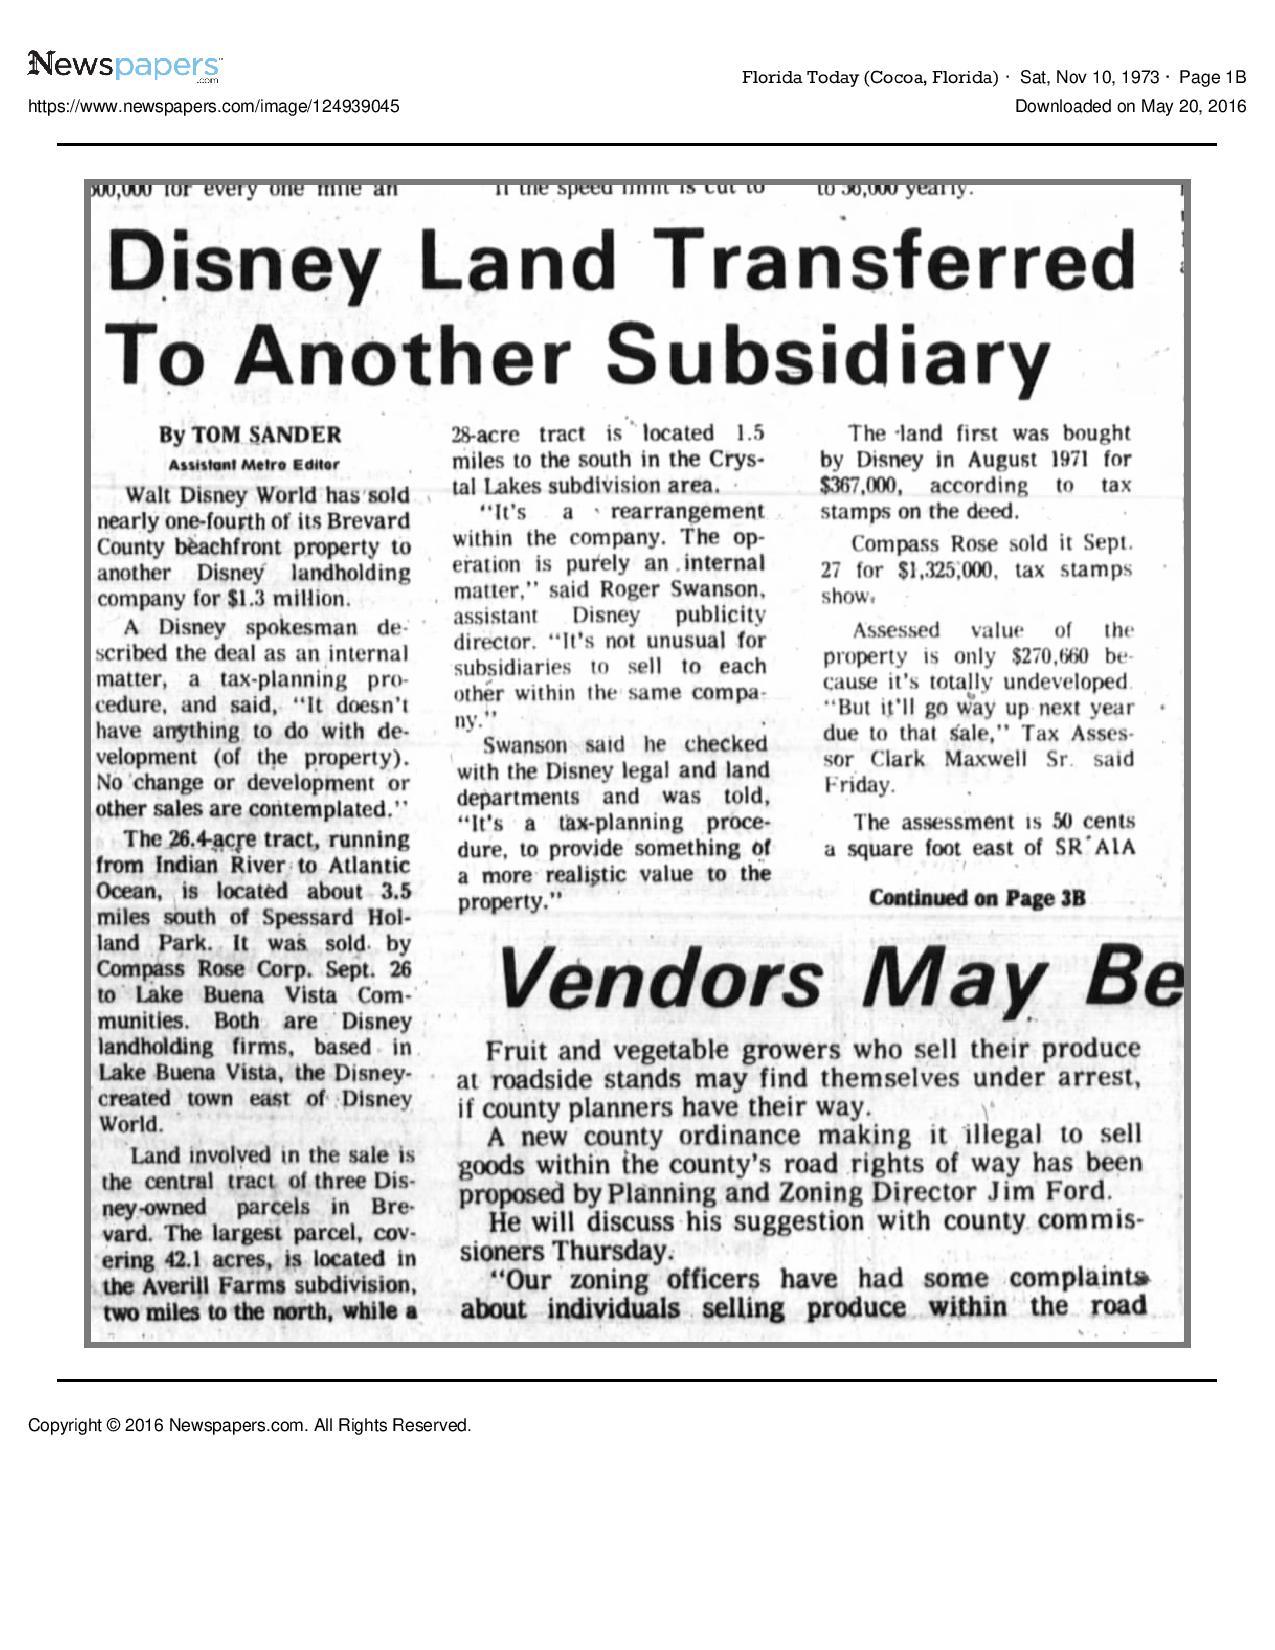 landtransfer1-page-001.jpg